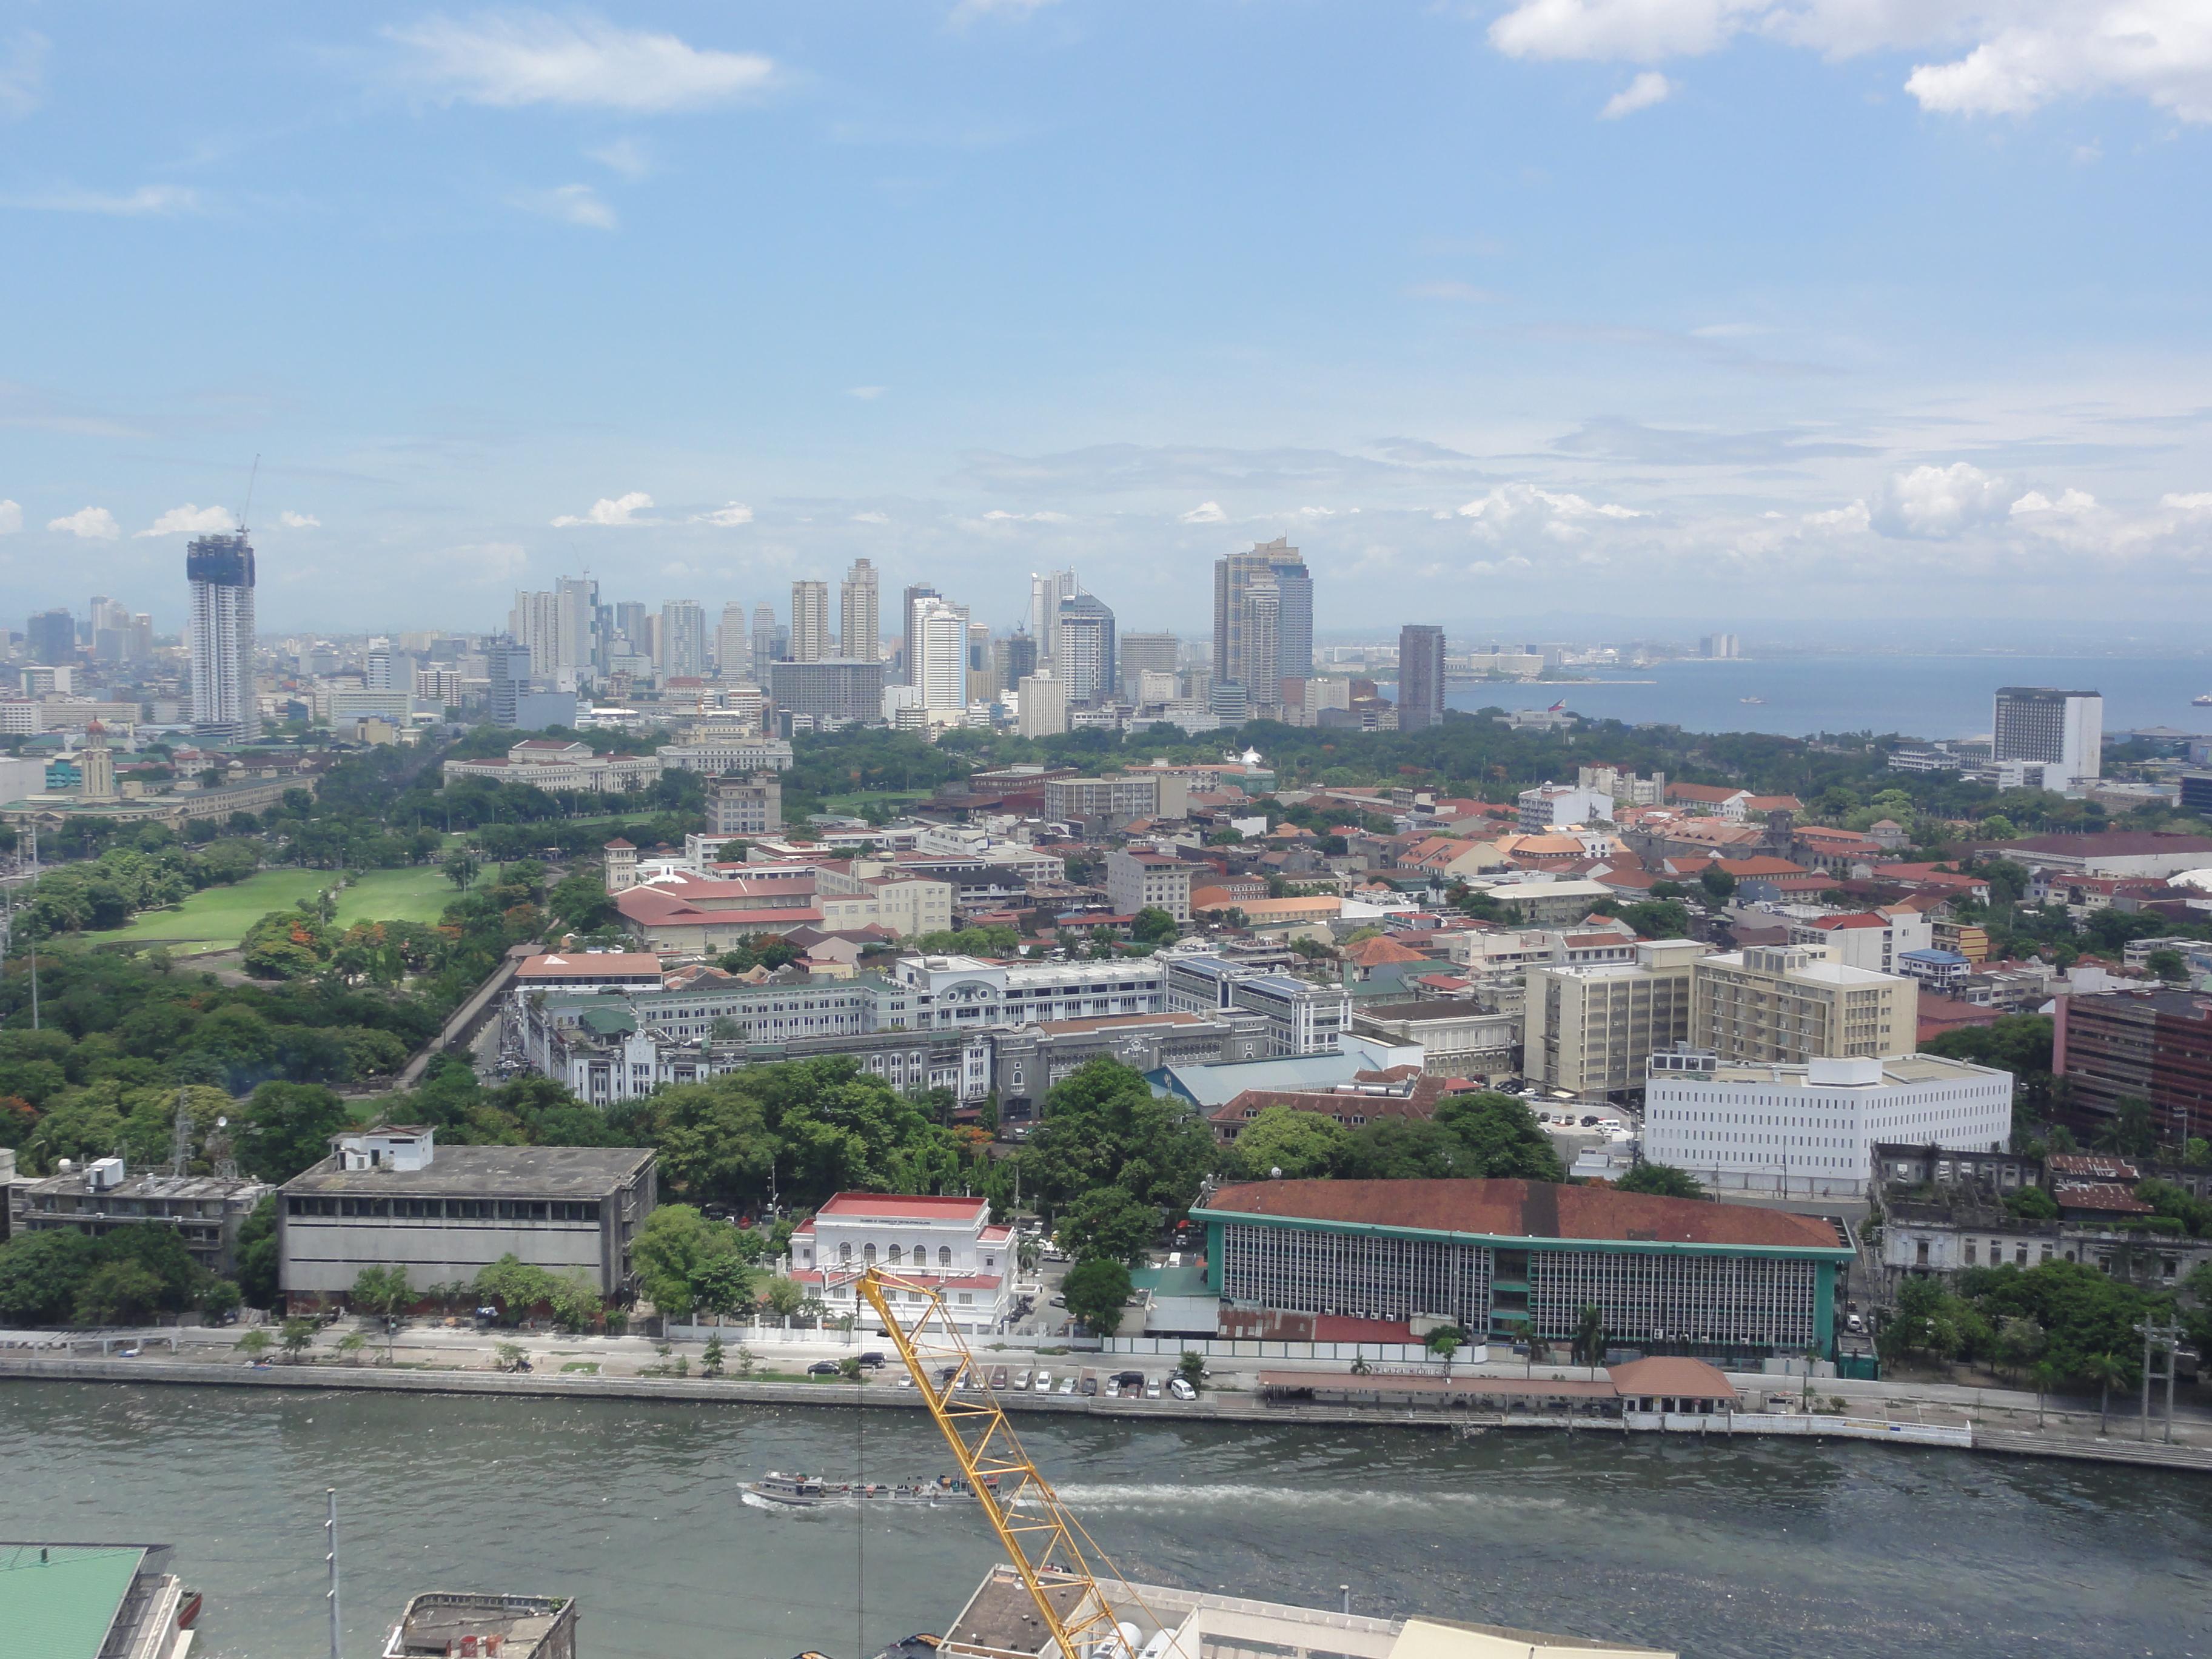 Pic_geo_photos_-_ph3Dmm3Dmanila_-_aerial_view_from_world_trade_exchange_tower_binondo_-philippines-2015-0615-ls-